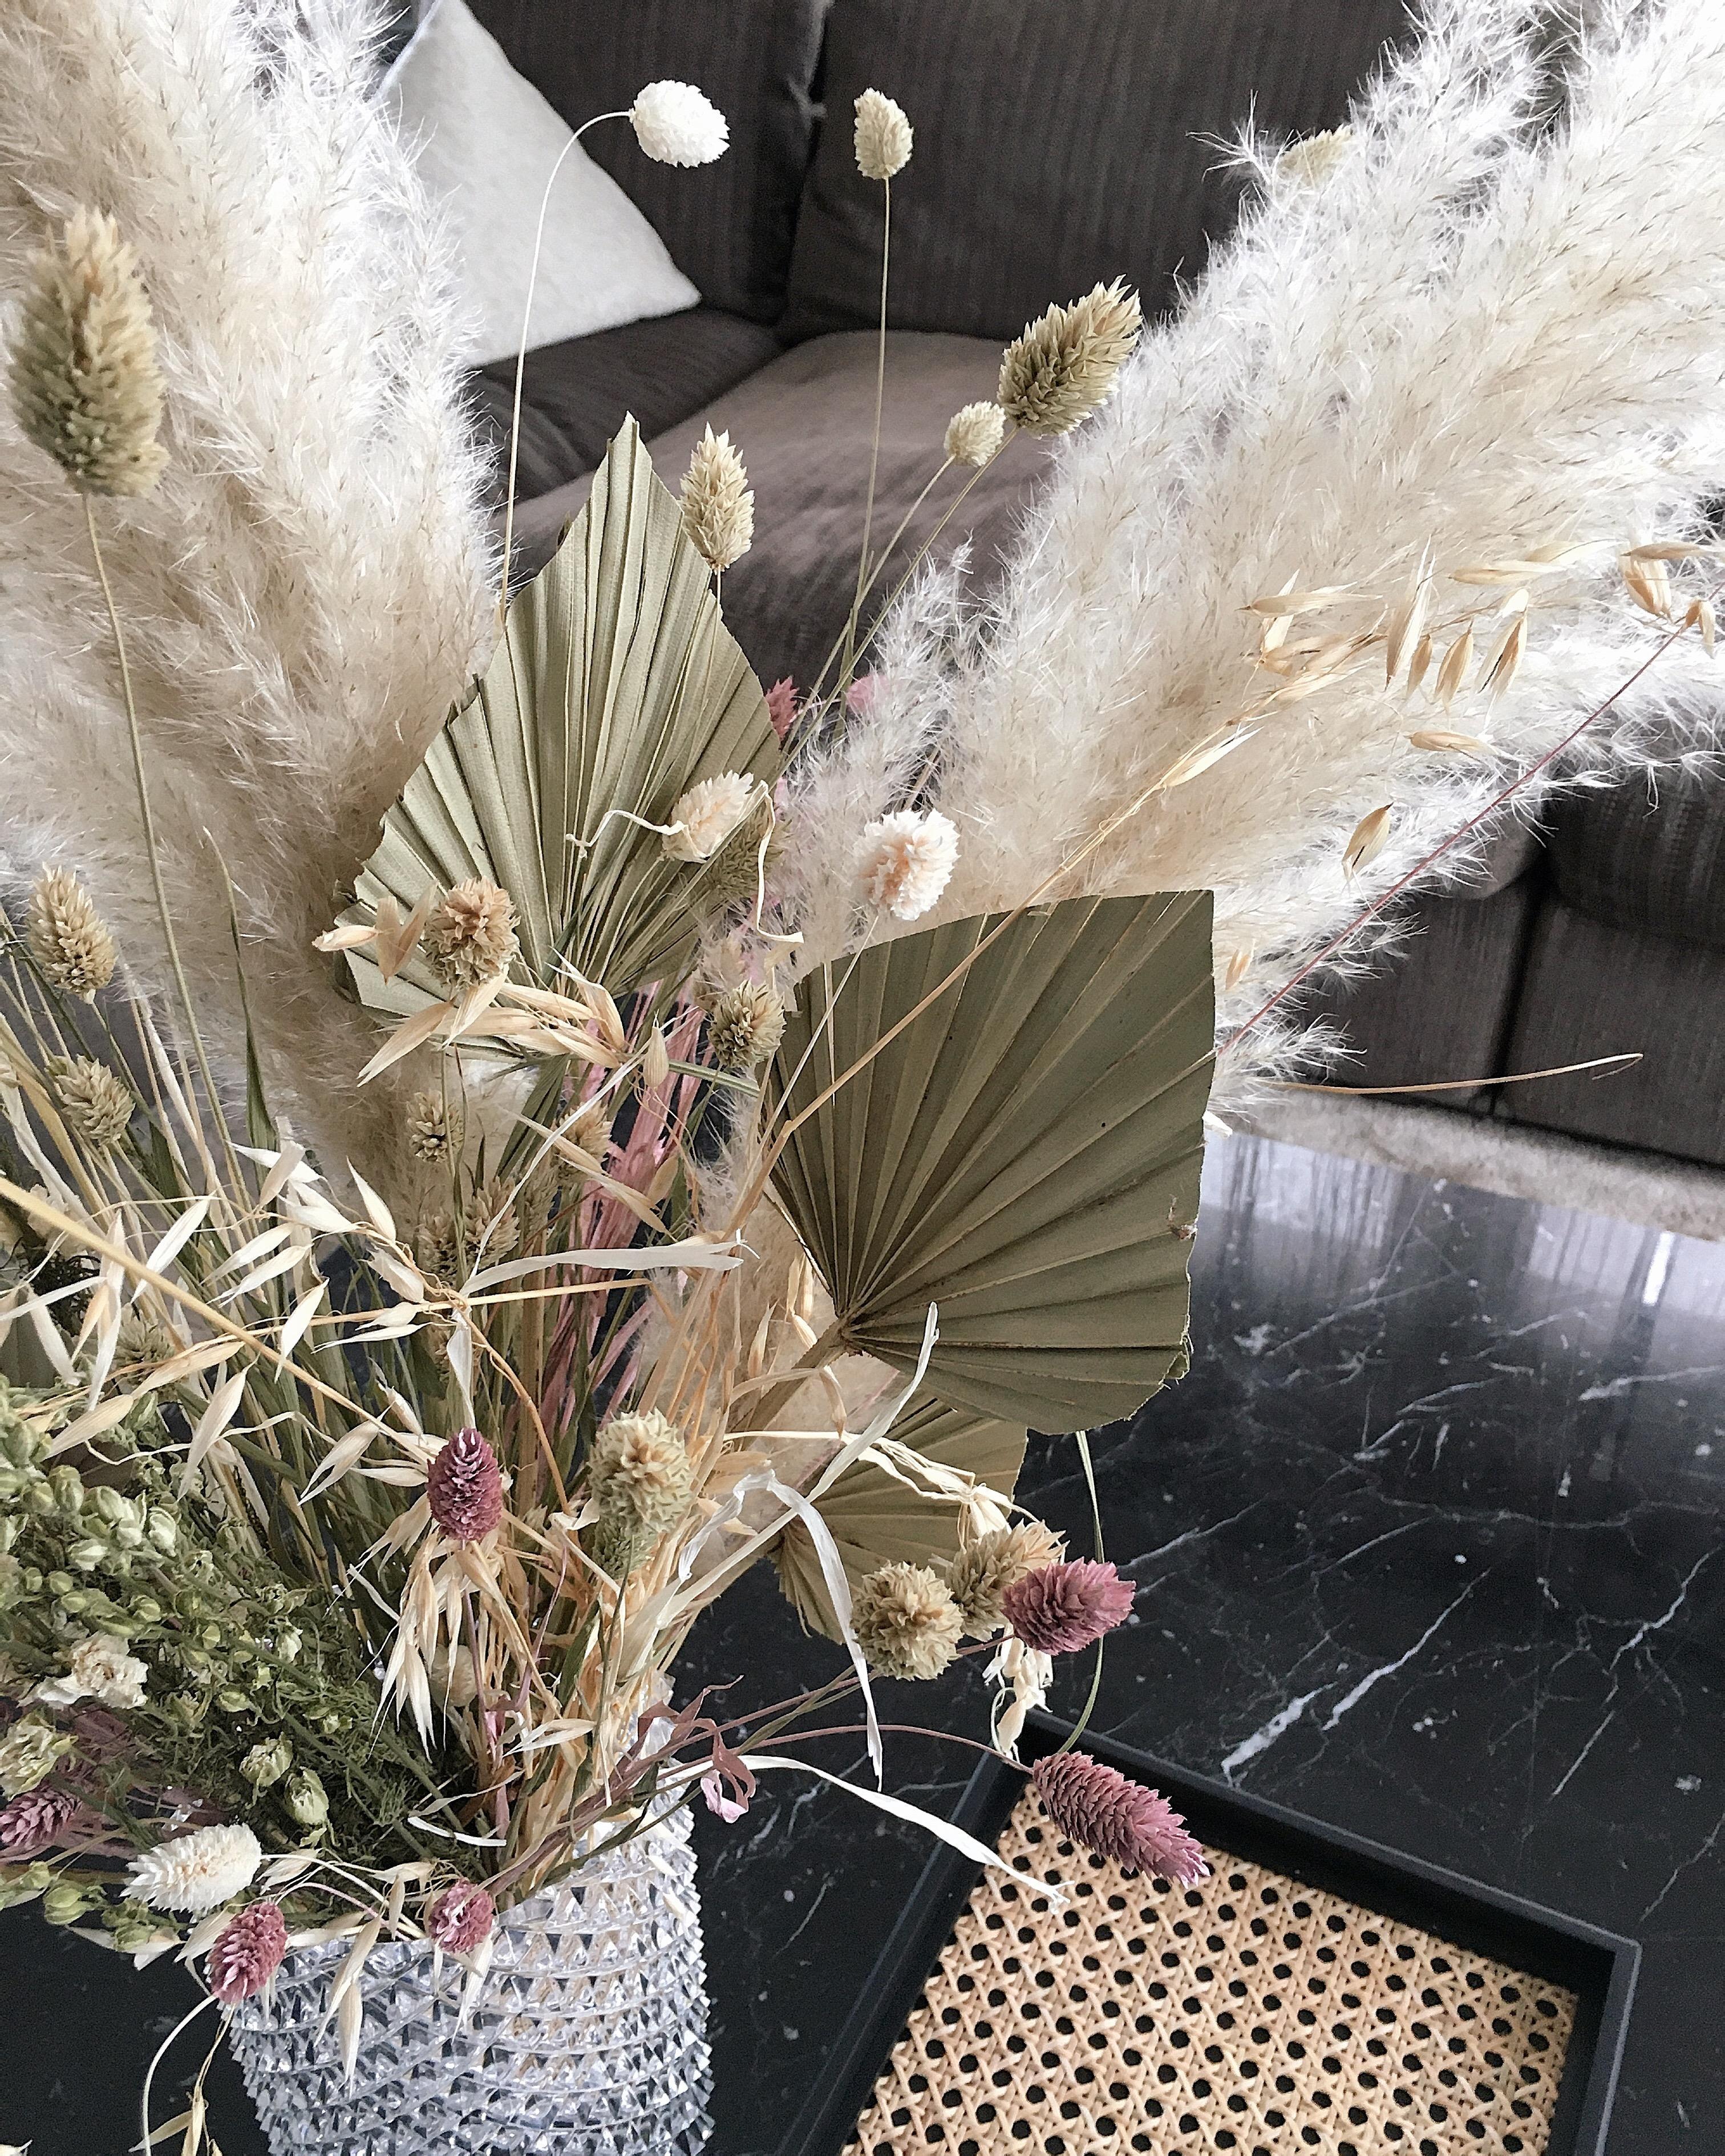 Cosy Homeoffice: Dried Flower Bouquet #freshflowerfriday #wintertime